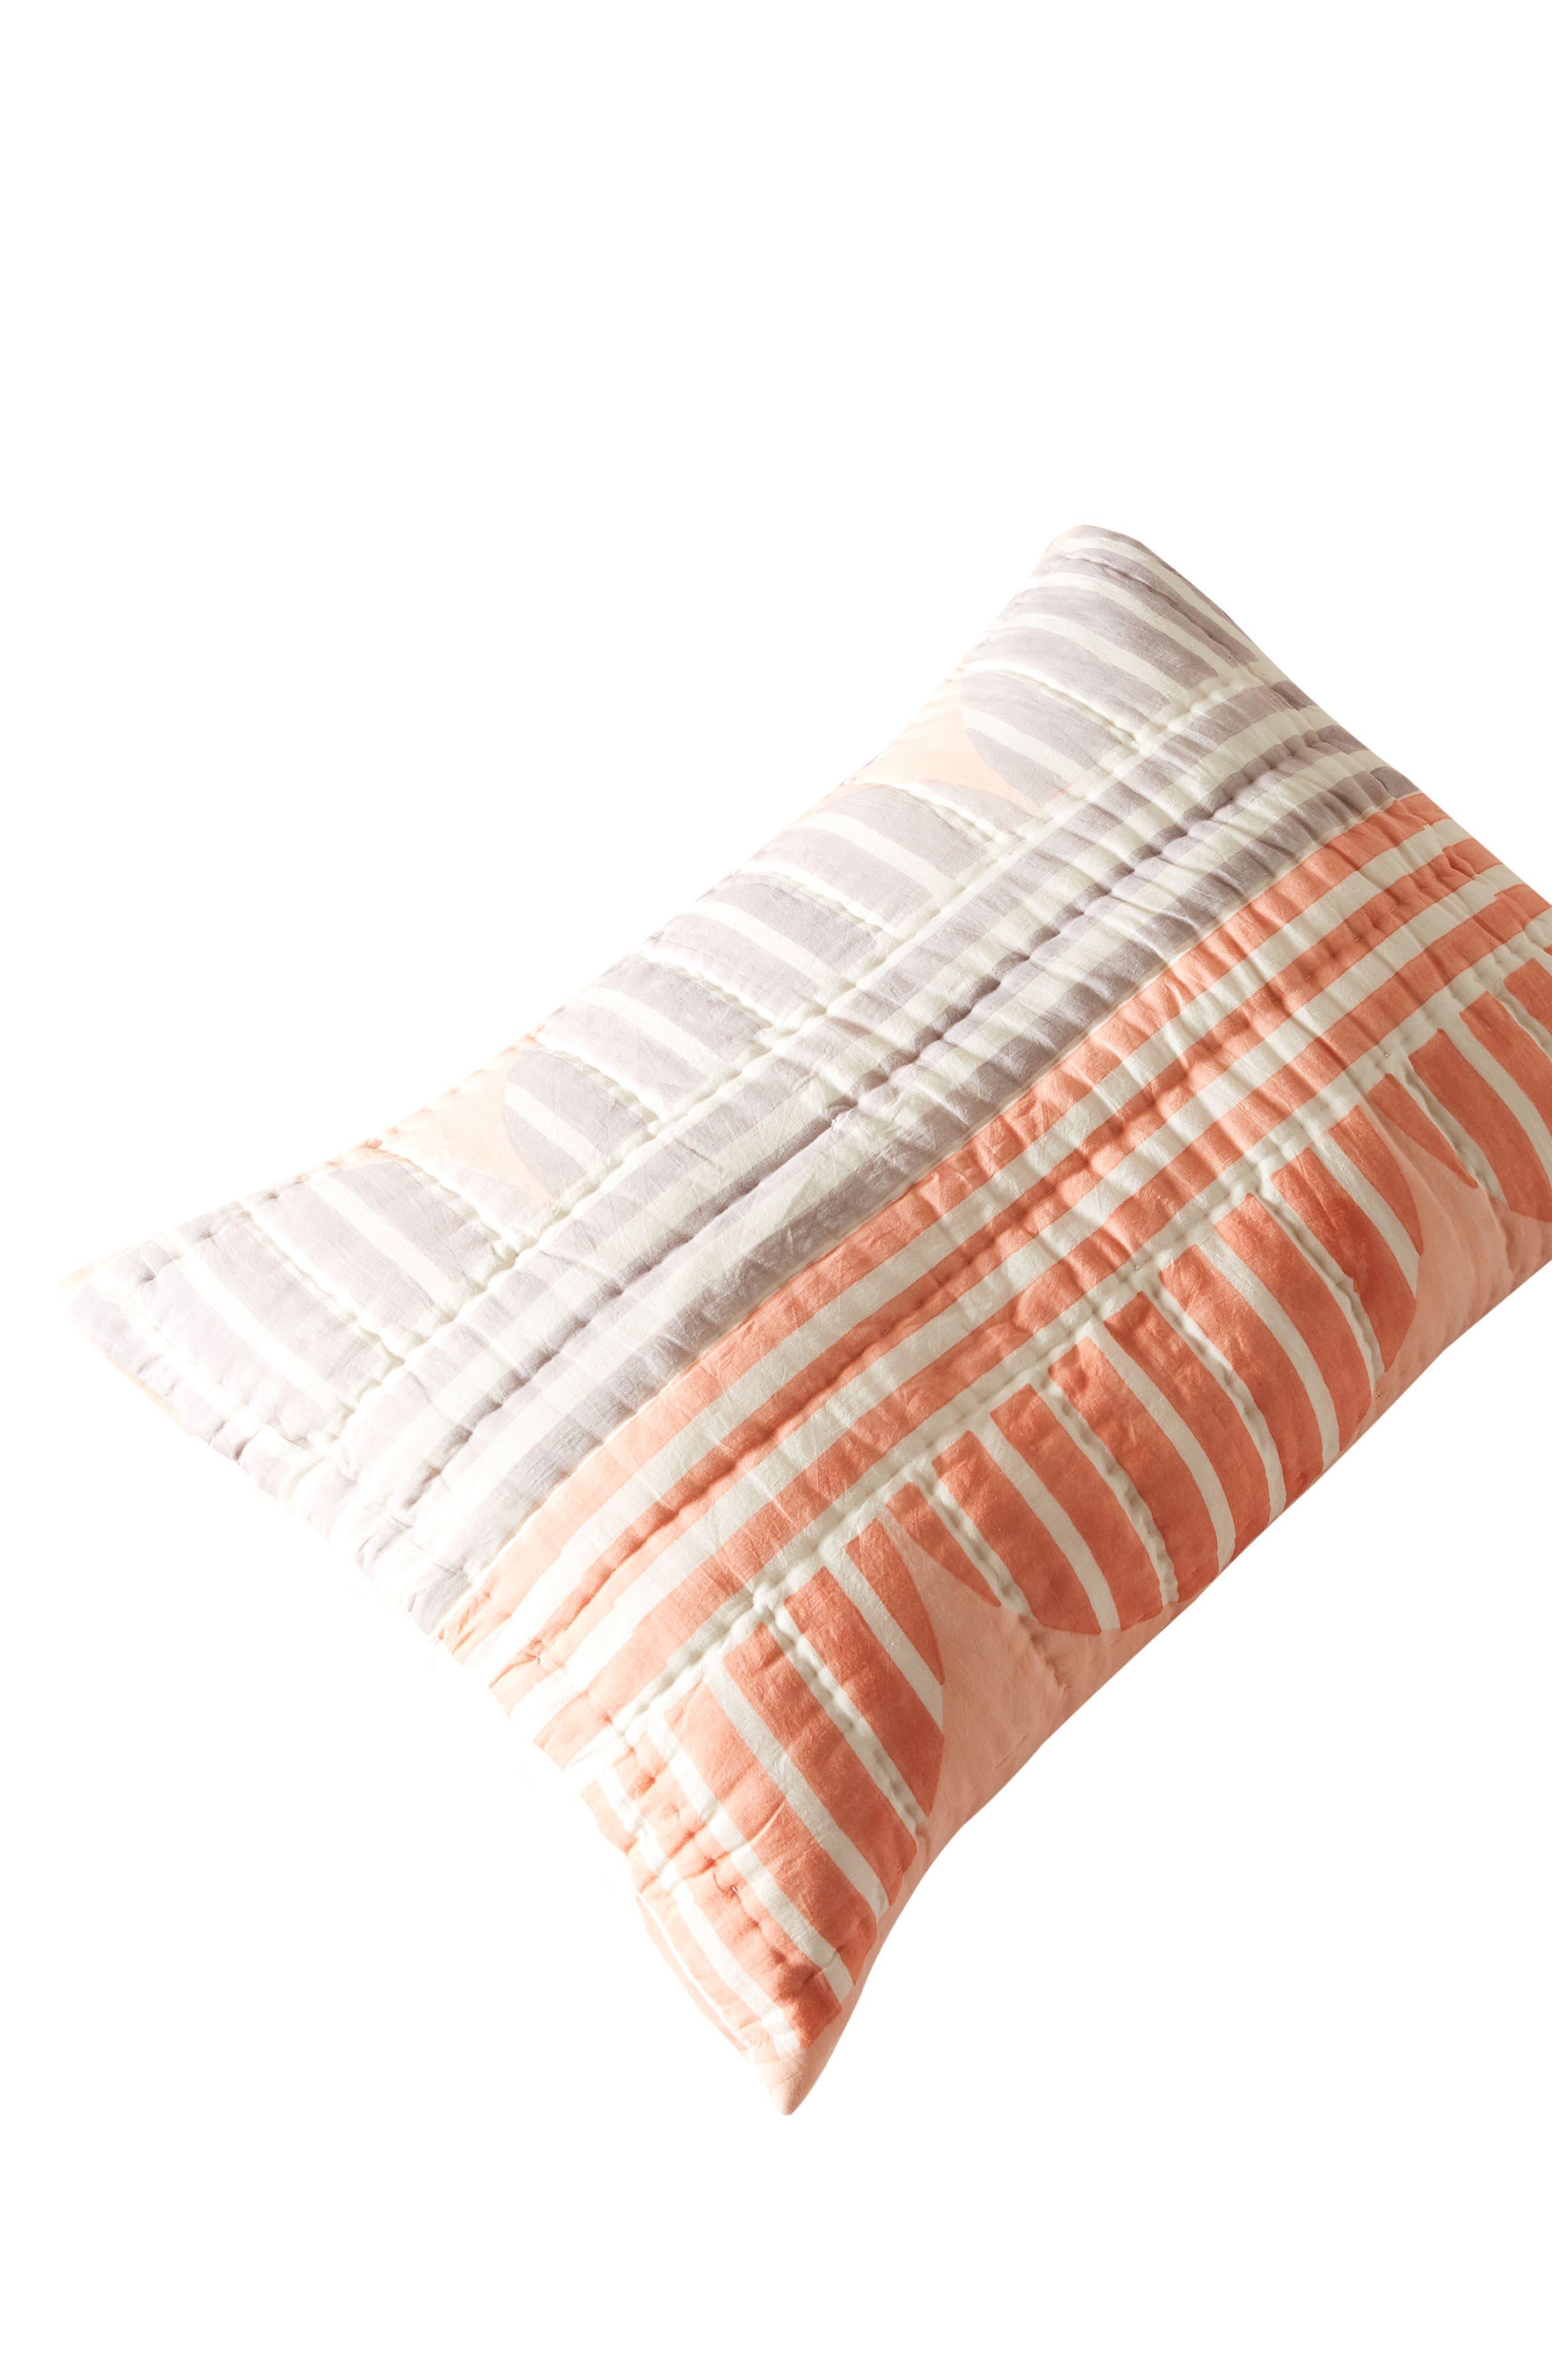 Stripe Geo Pillow Shams,                             Alternate thumbnail 2, color,                             650